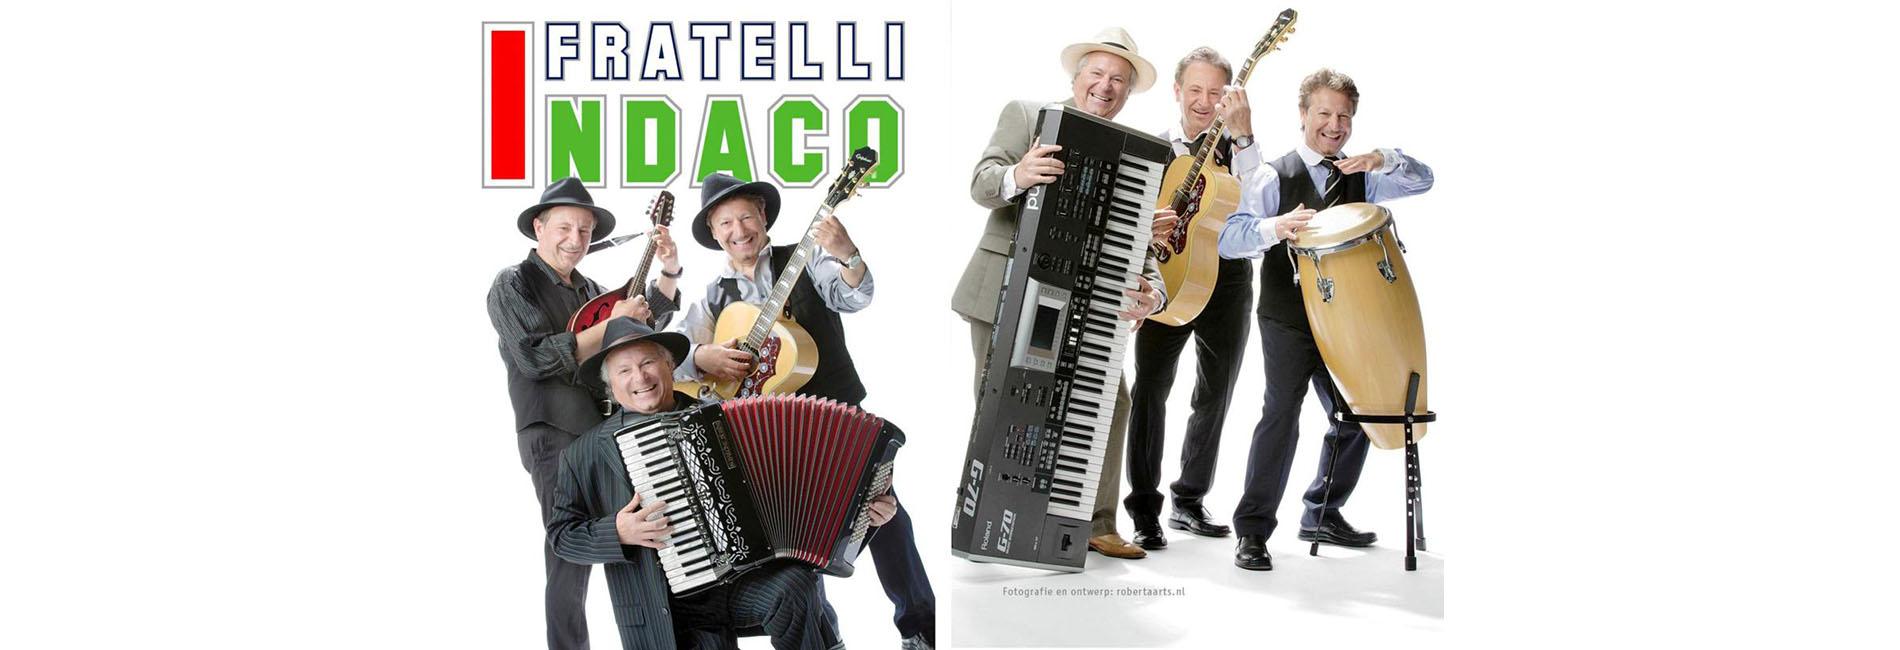 Italiaanse band I Fratelli Indaco HEADER 1